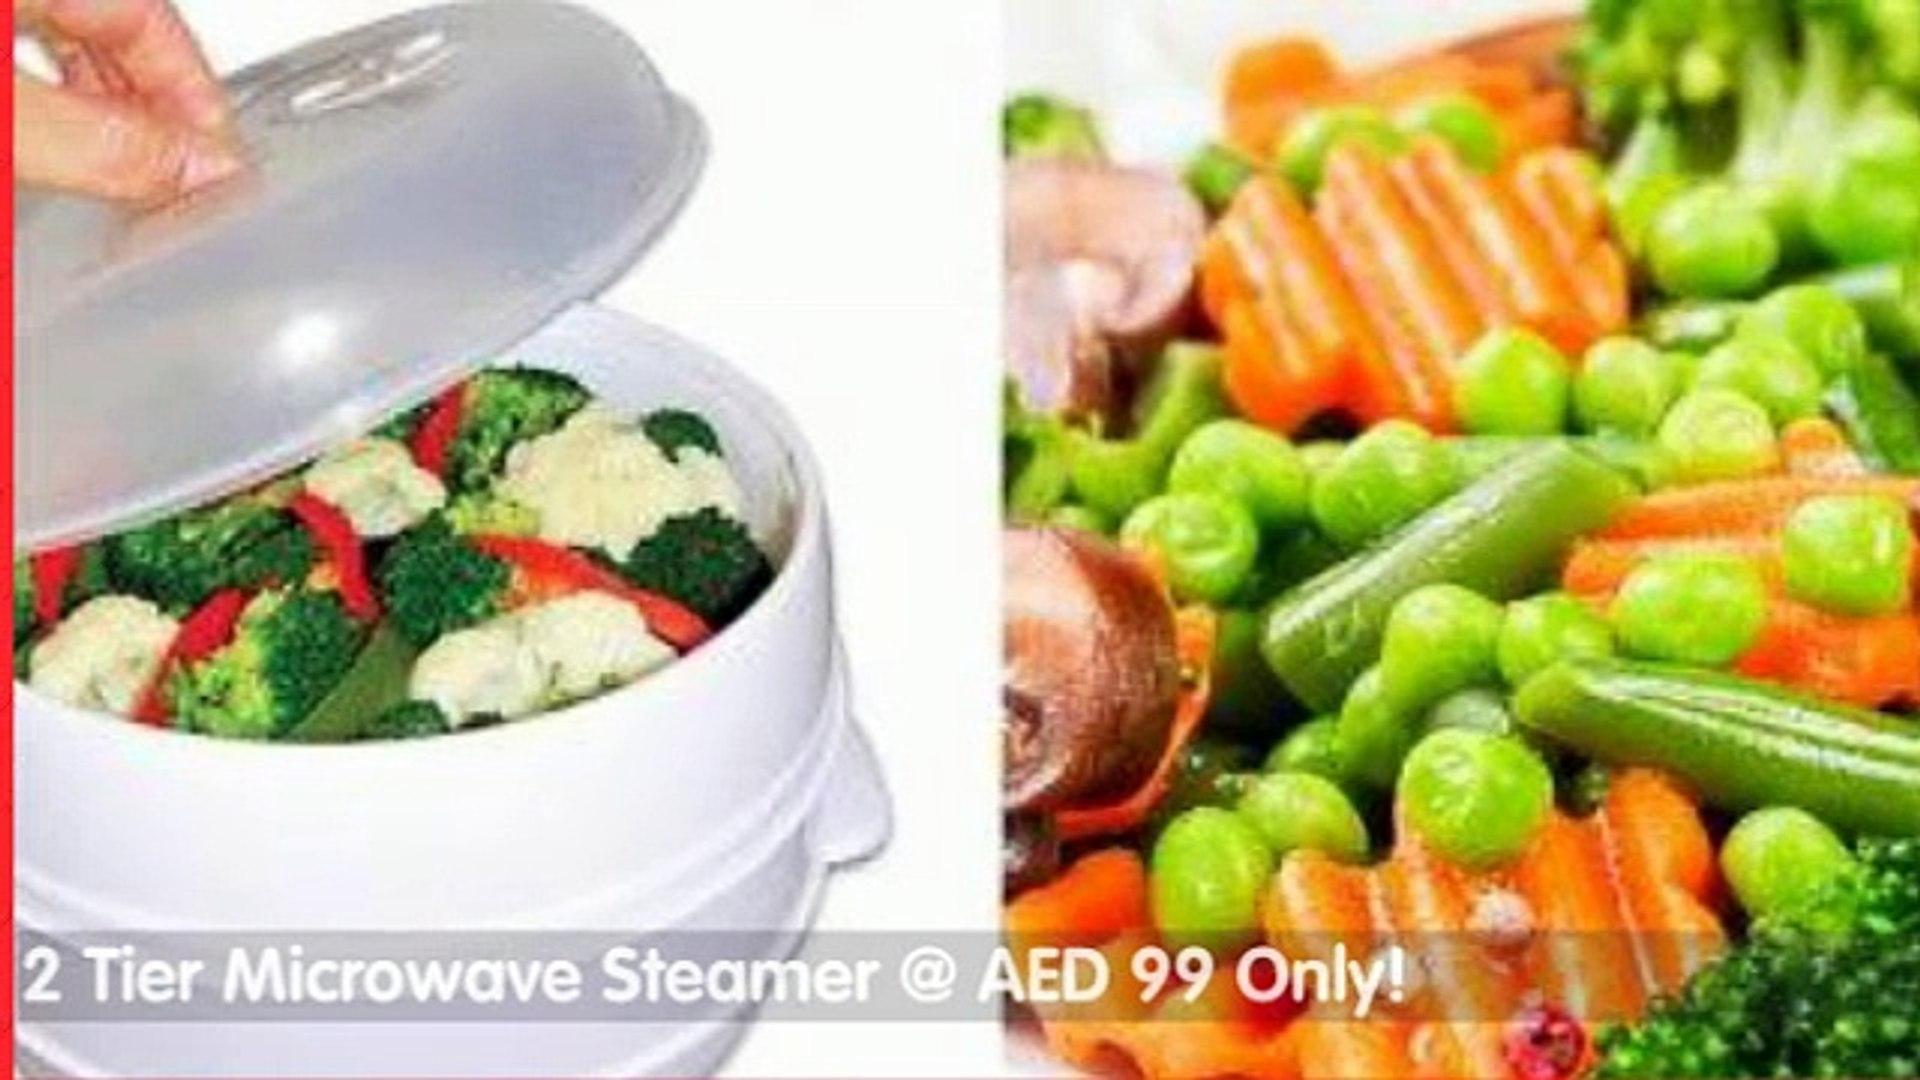 Dubai - homware products